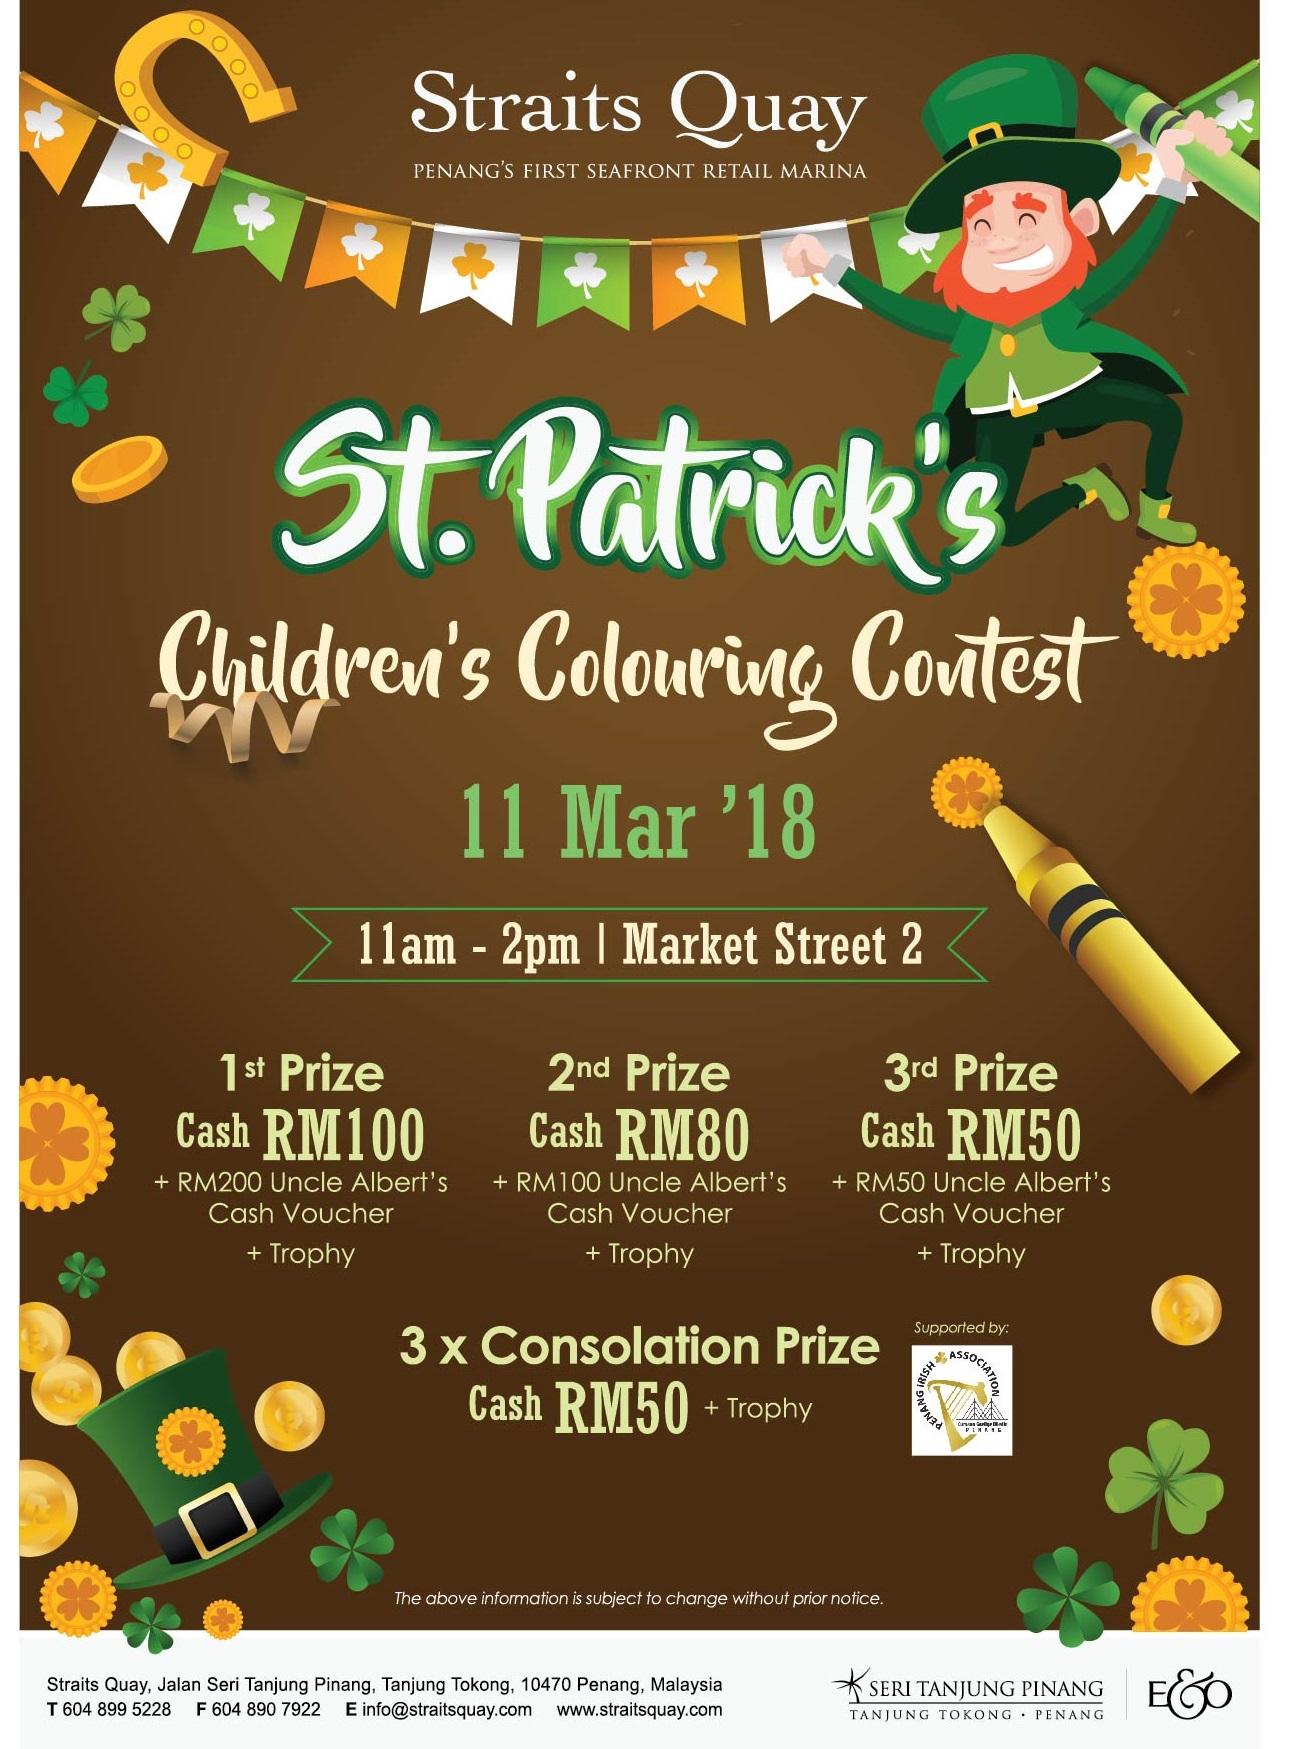 ST. PATRICK'S CHILDREN'S COLOURING CONTEST